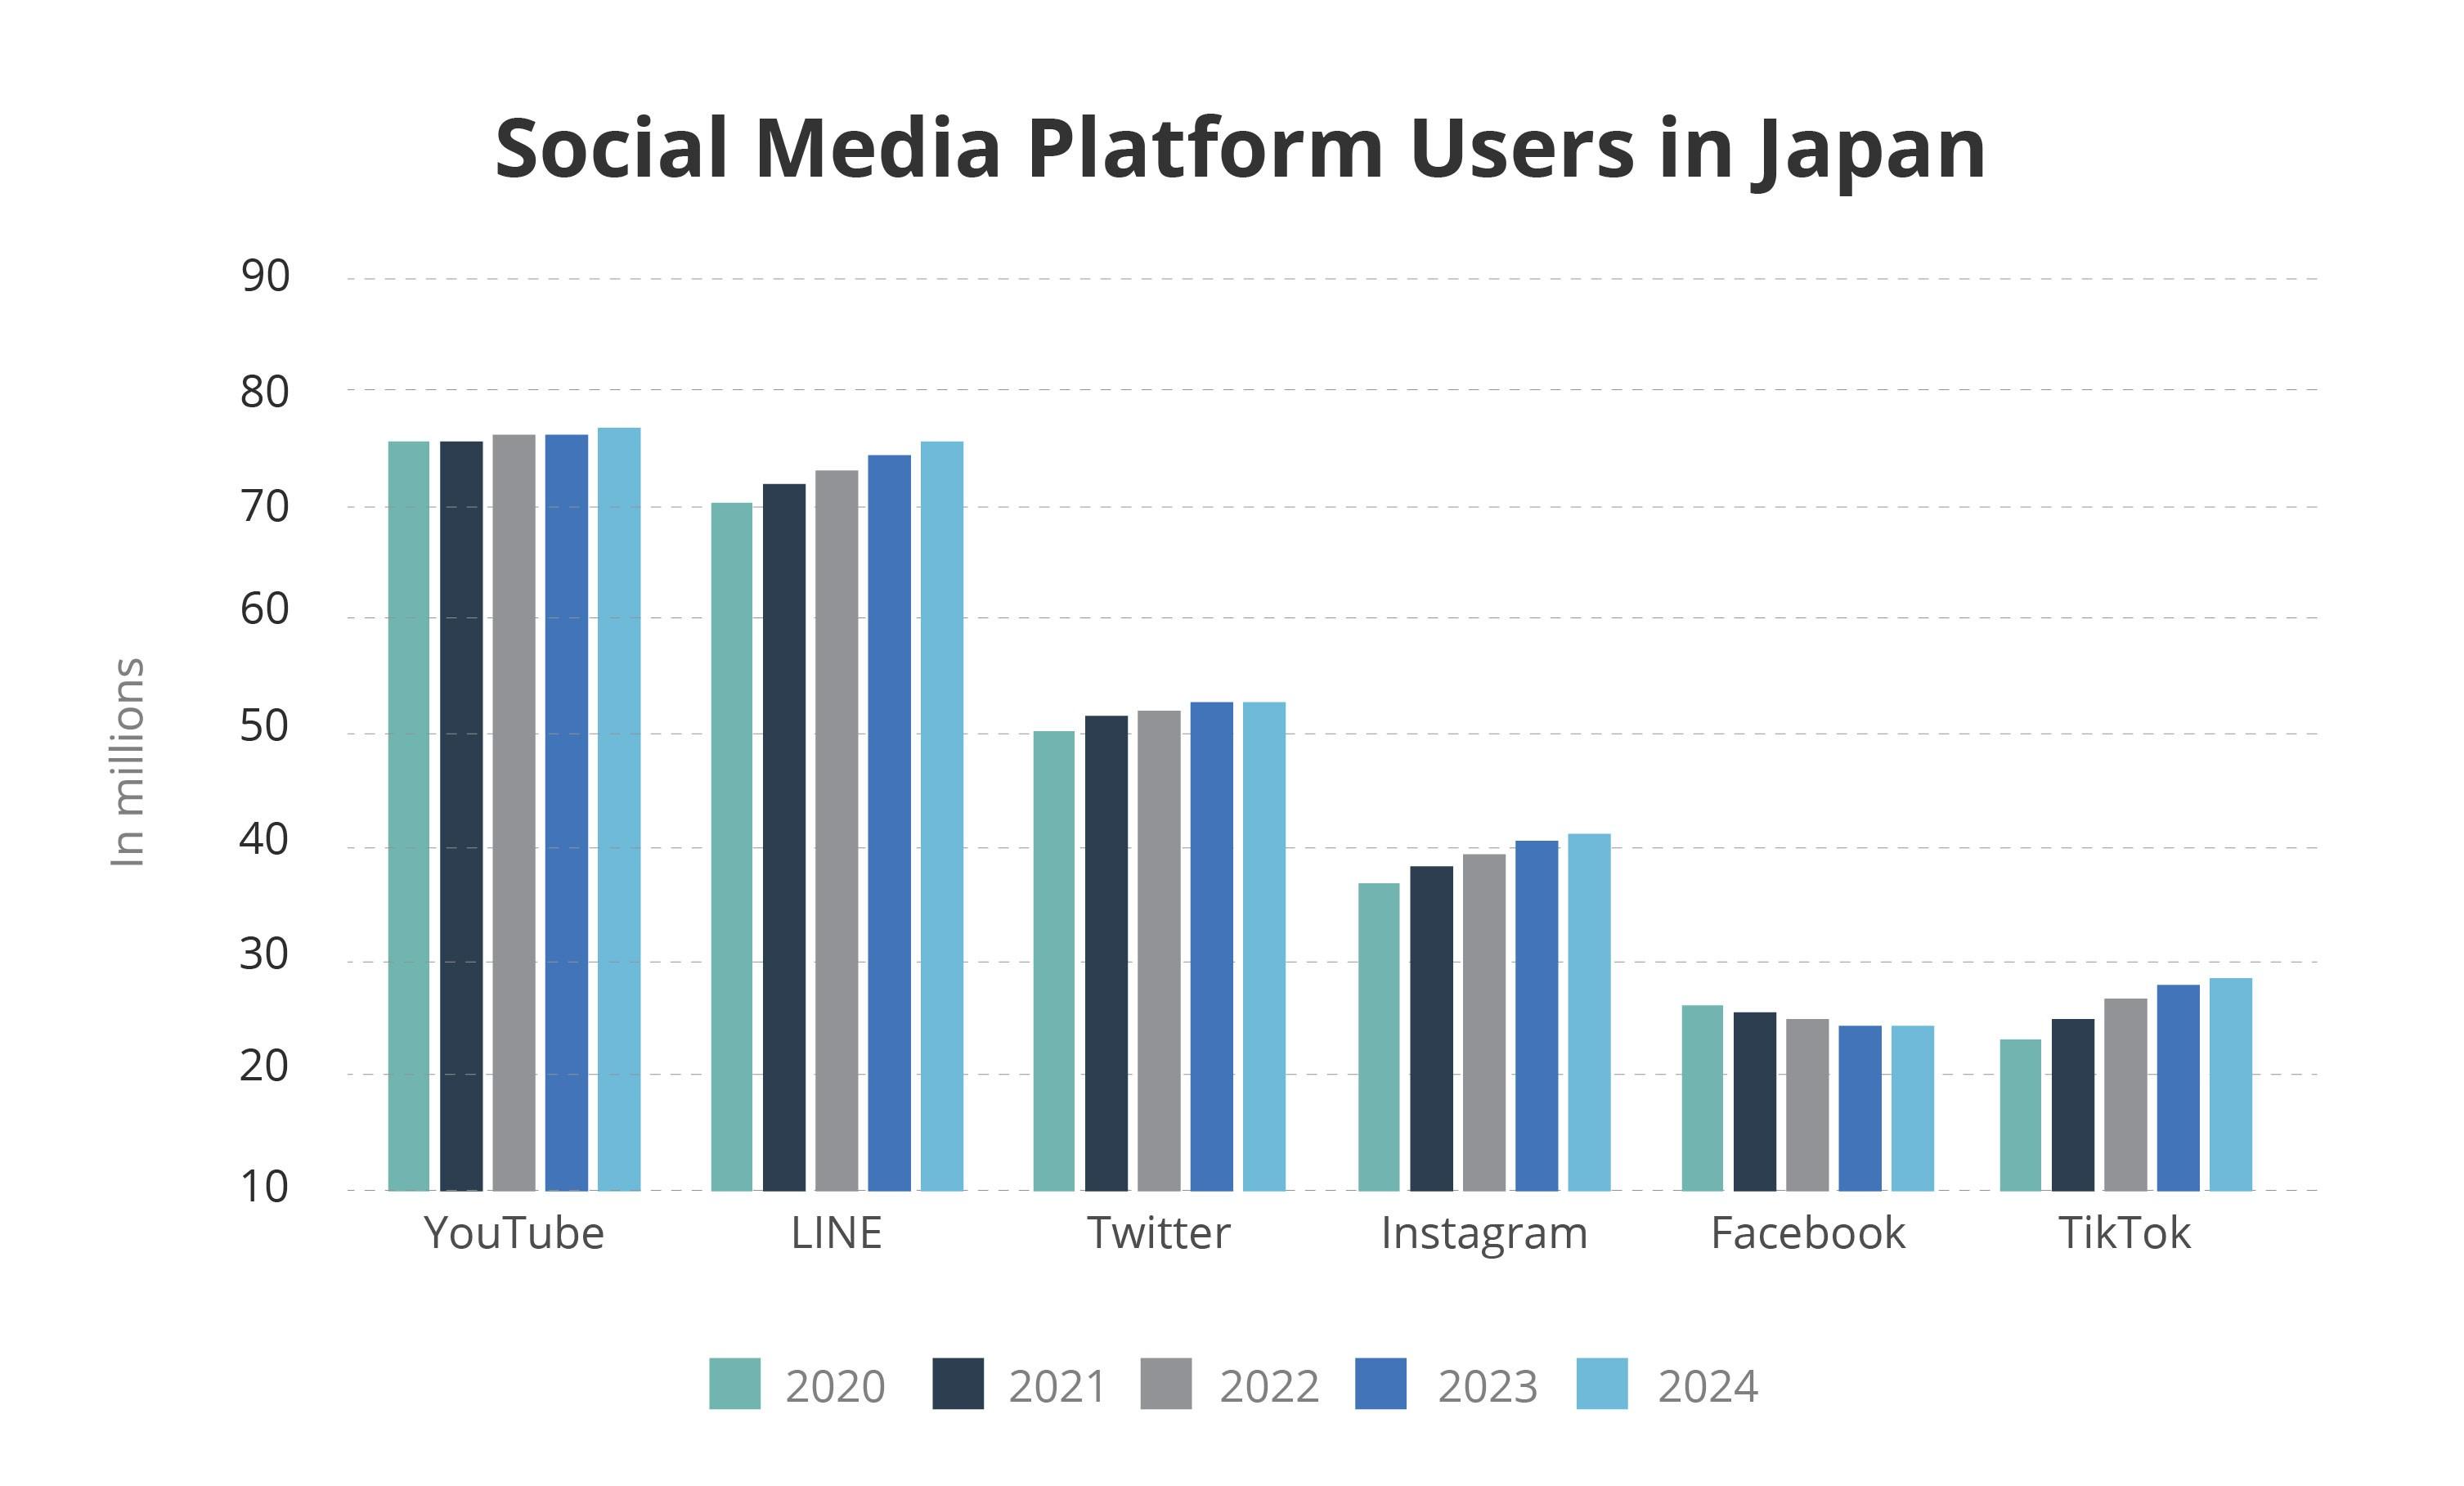 Social media platform users in Japan (2020 to 2024)